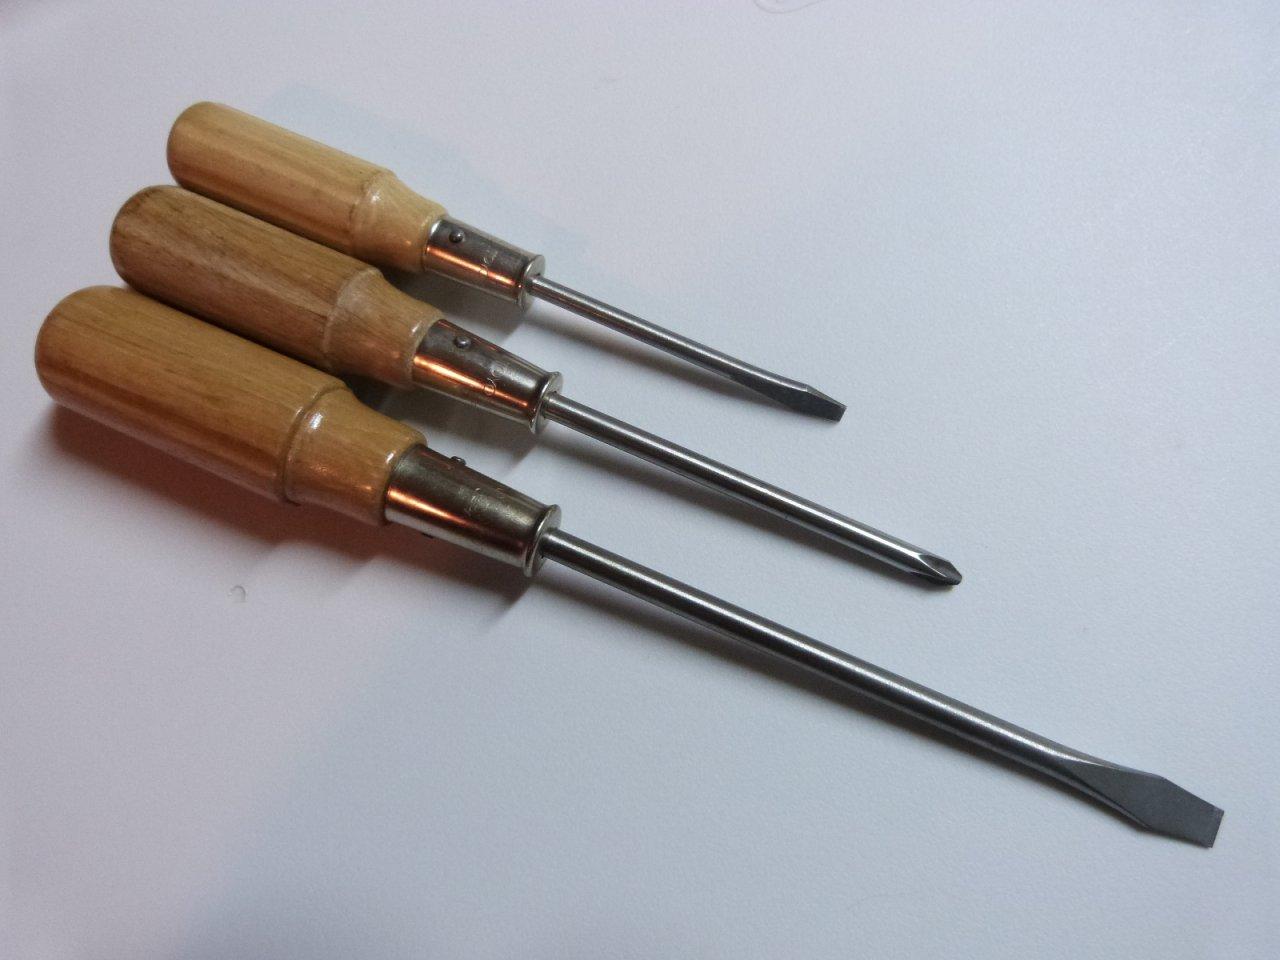 screwdrivers - toyota motor.JPG